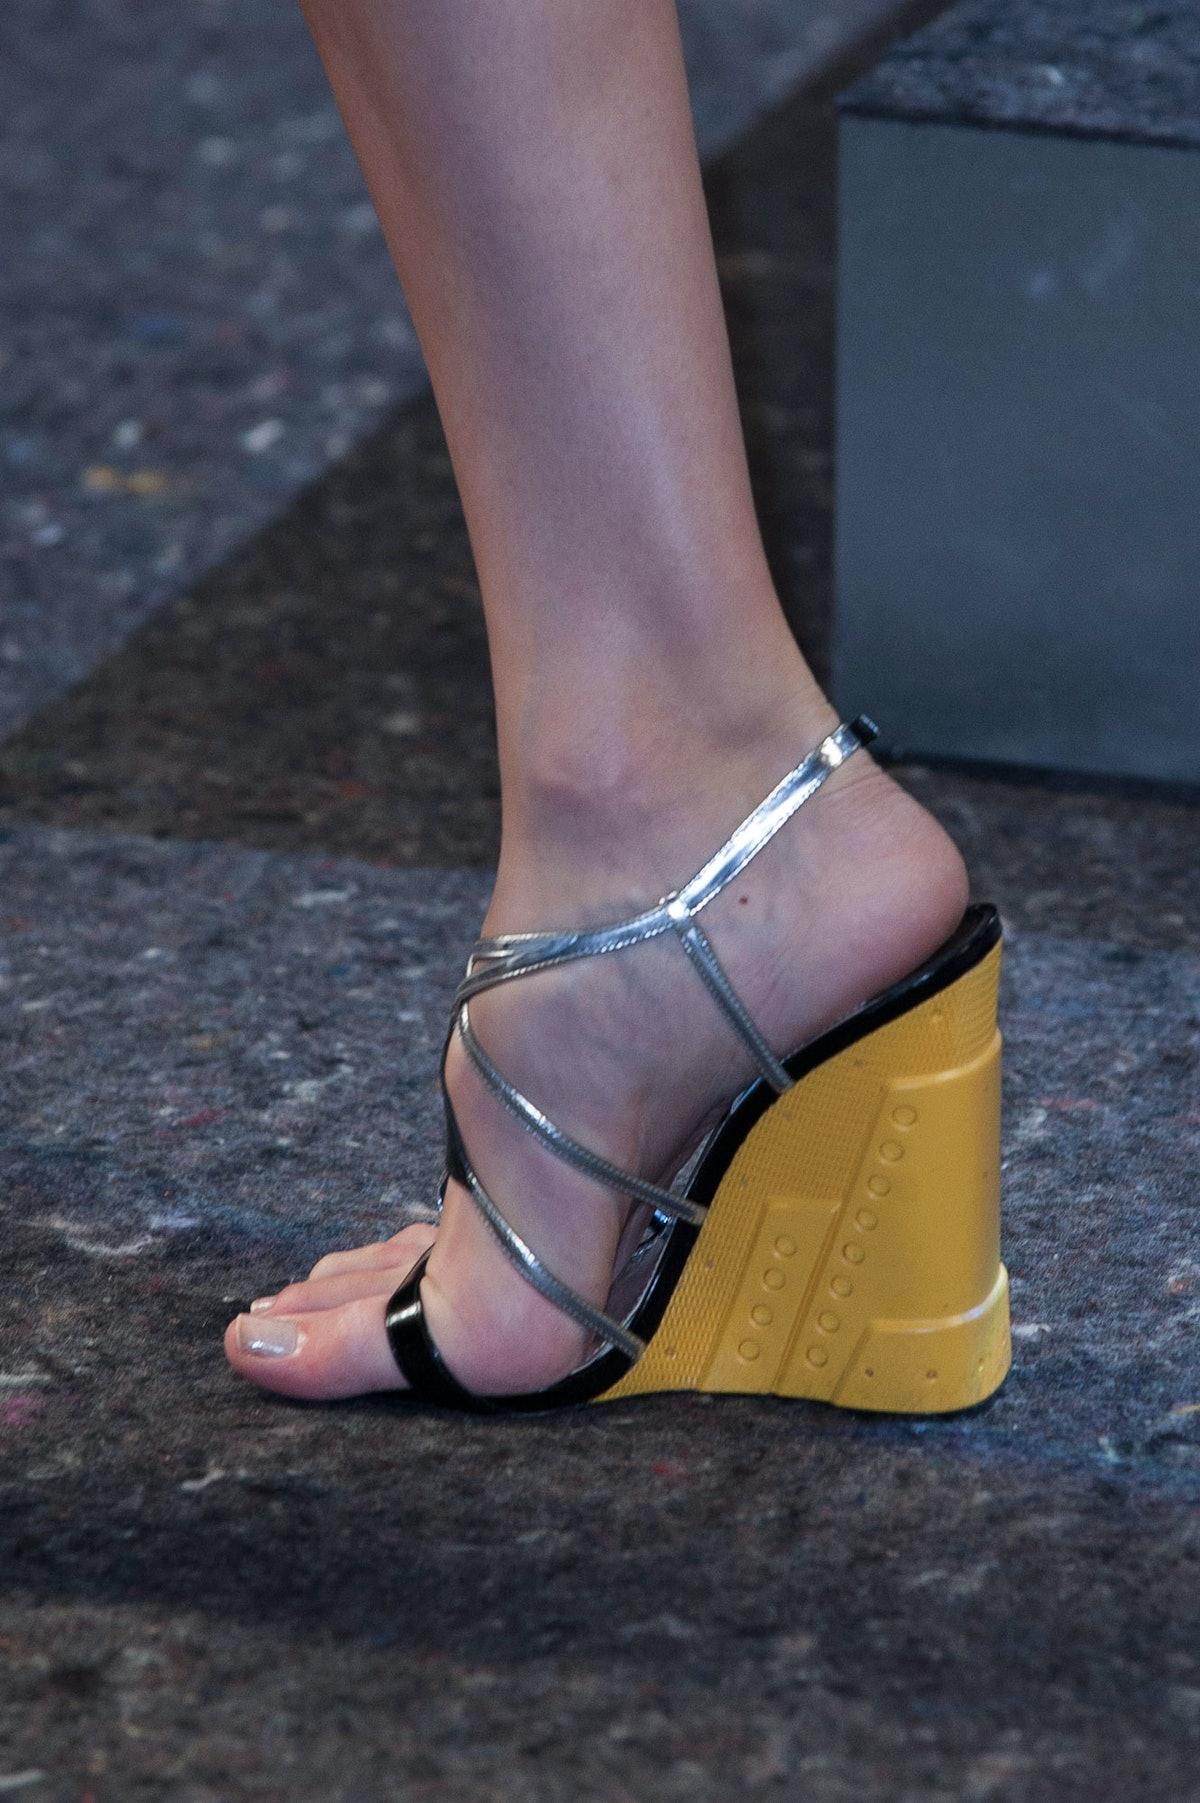 Prada Fall 2014 Shoes